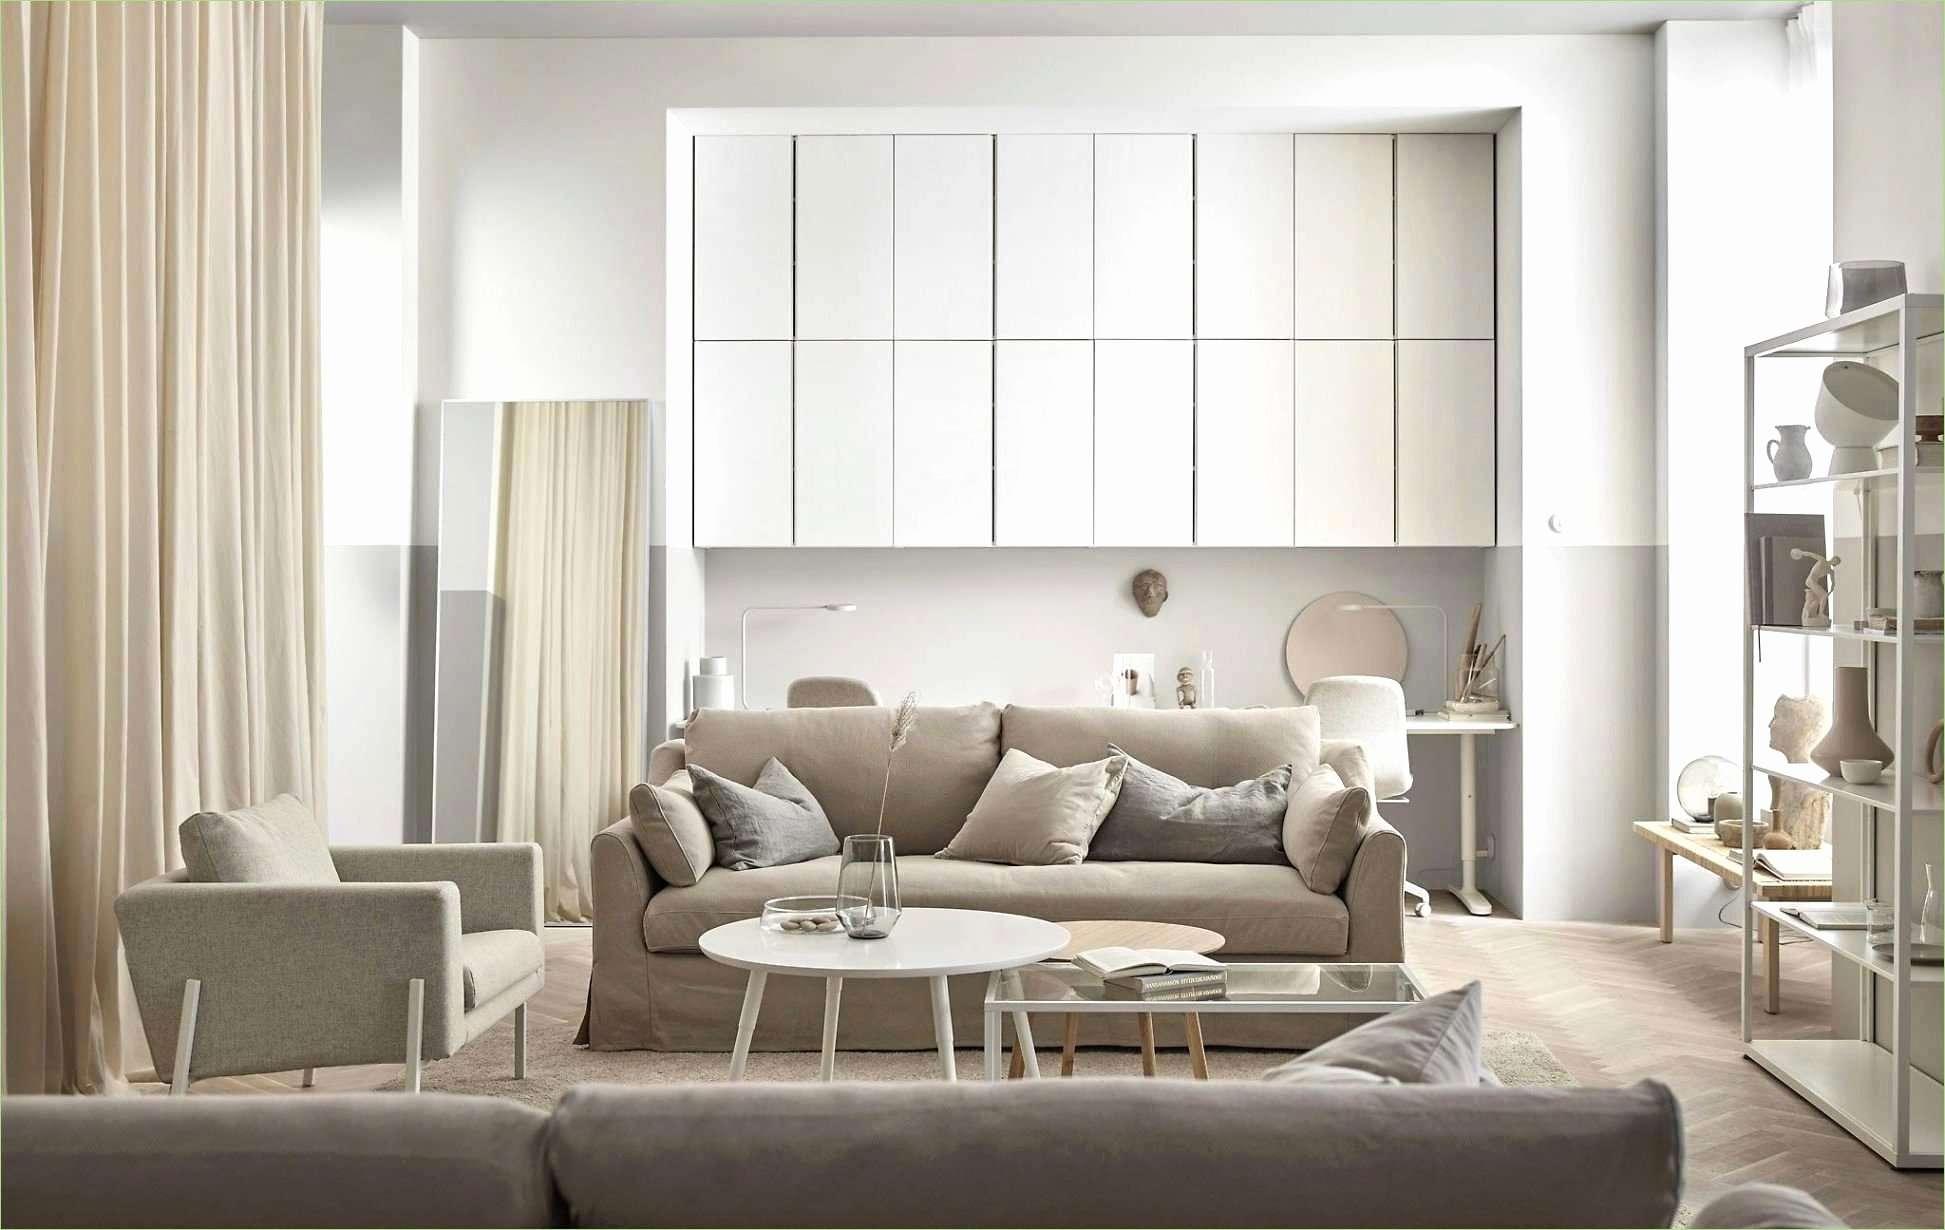 fenster gardinen ideen designs balkonboden ideen neu balkon schema design fdfl of fenster gardinen wohnzimmer